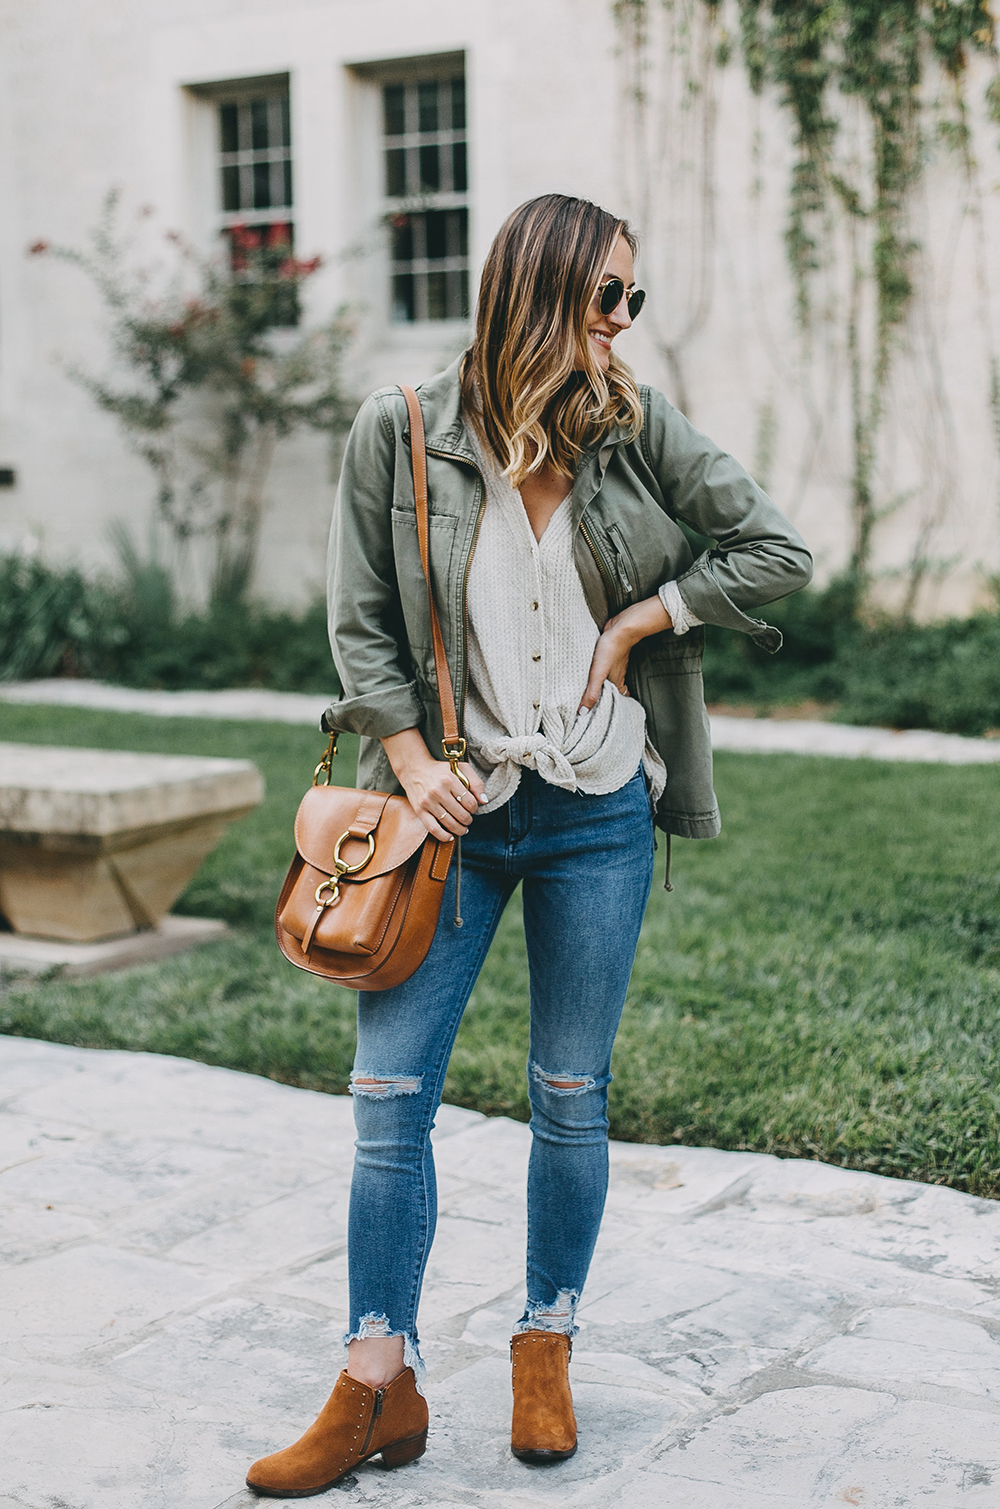 livvyland-blog-olivia-watson-austin-texas-fashion-blogger-minnatonka-moccasins-tan-suede-ankle-booties-madewell-utility-fleet-jacket-13